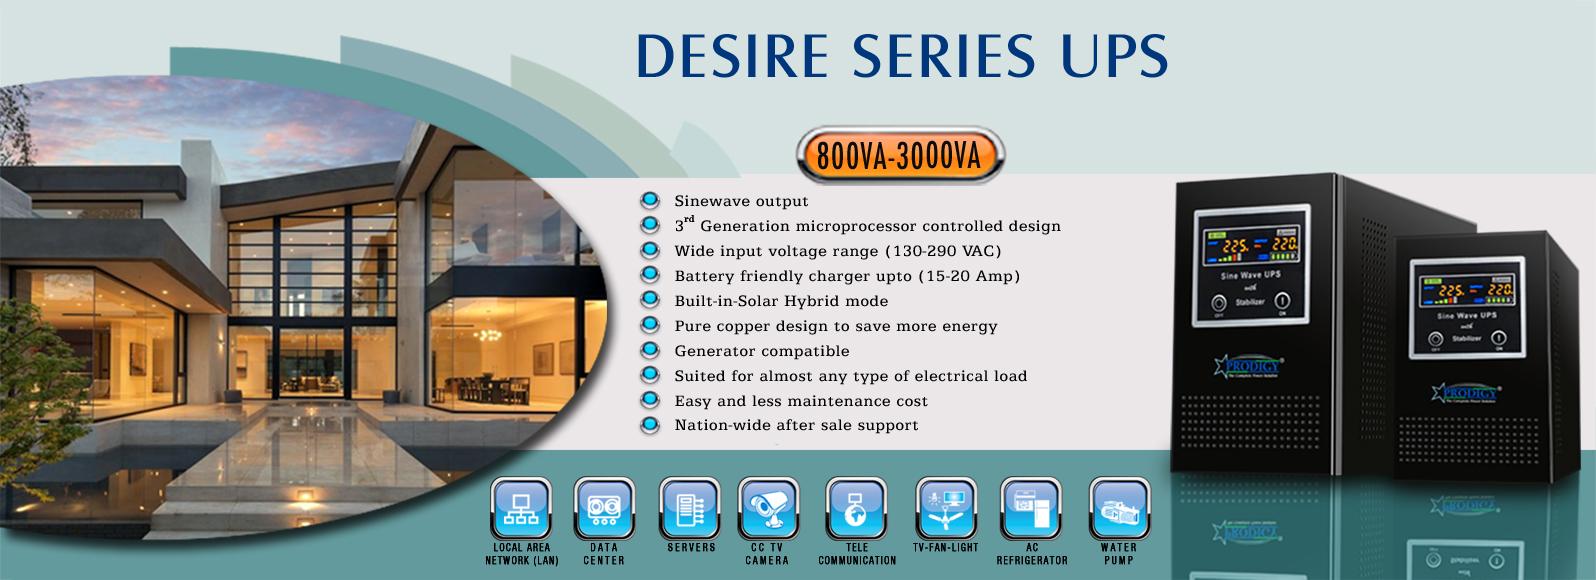 Desire Series UPS